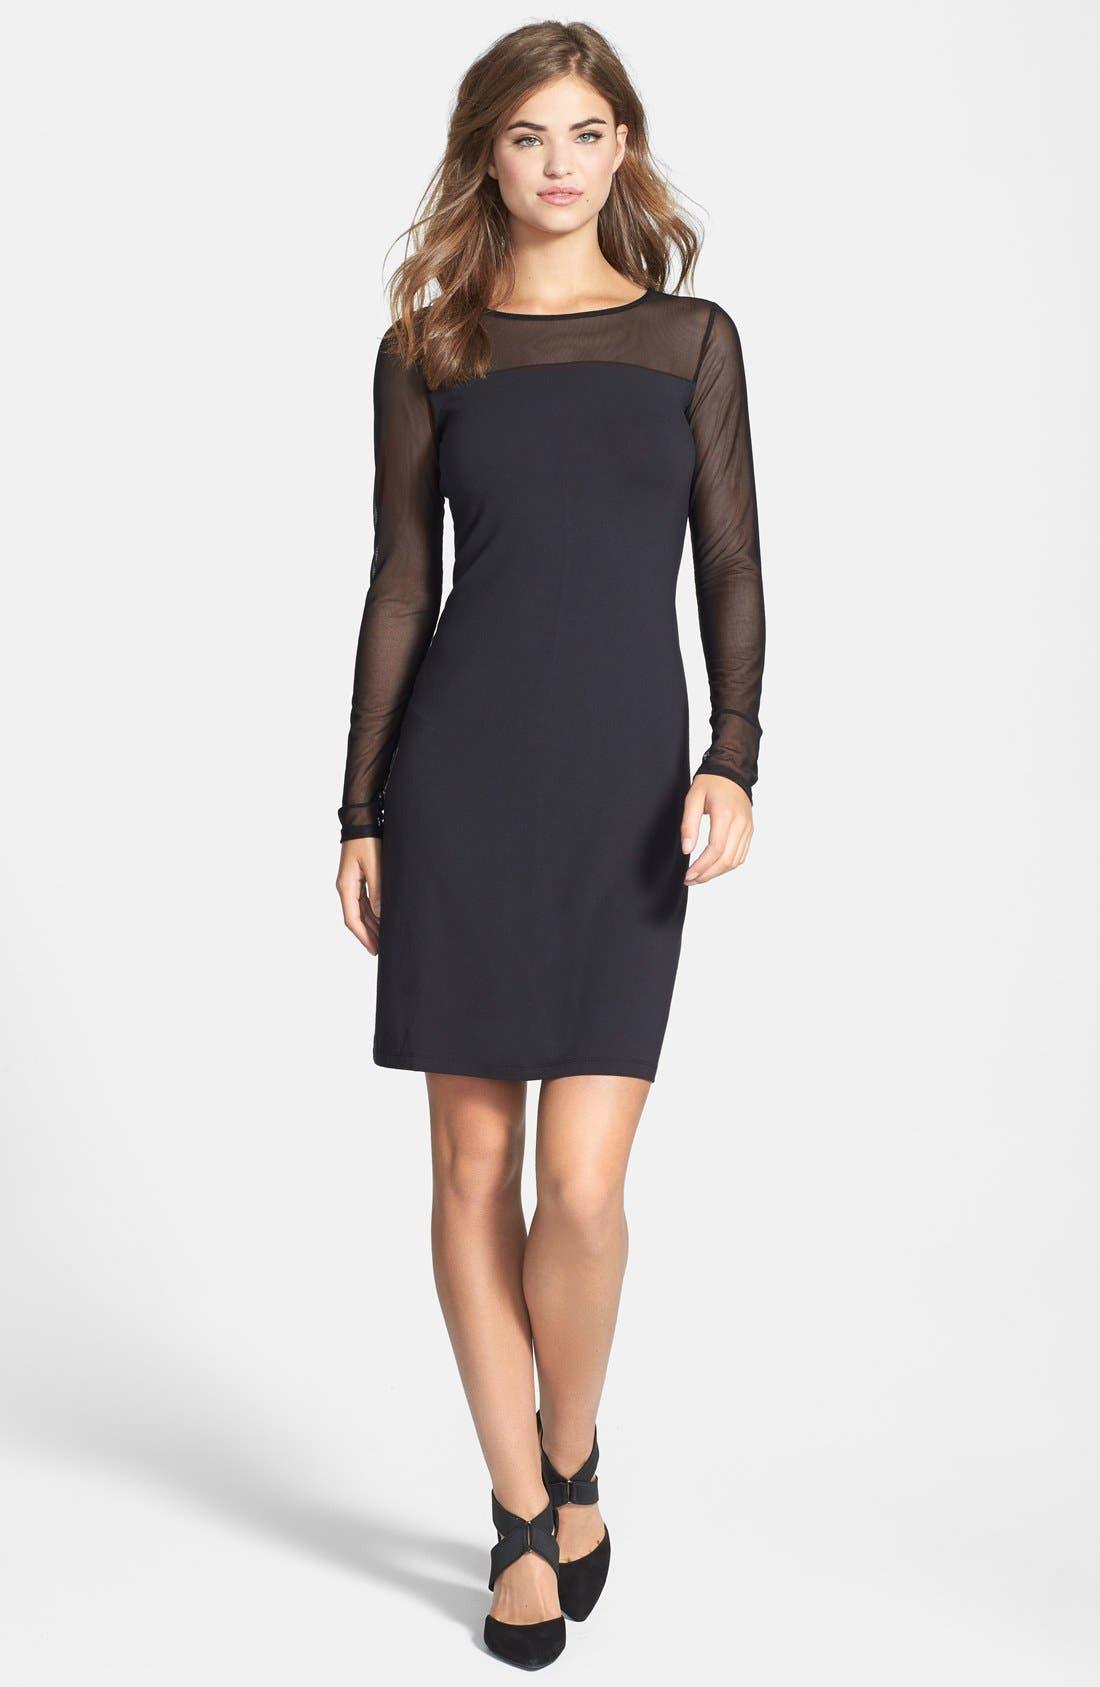 Main Image - Tommy Bahama 'Gower' Illusion Neck Jersey Dress